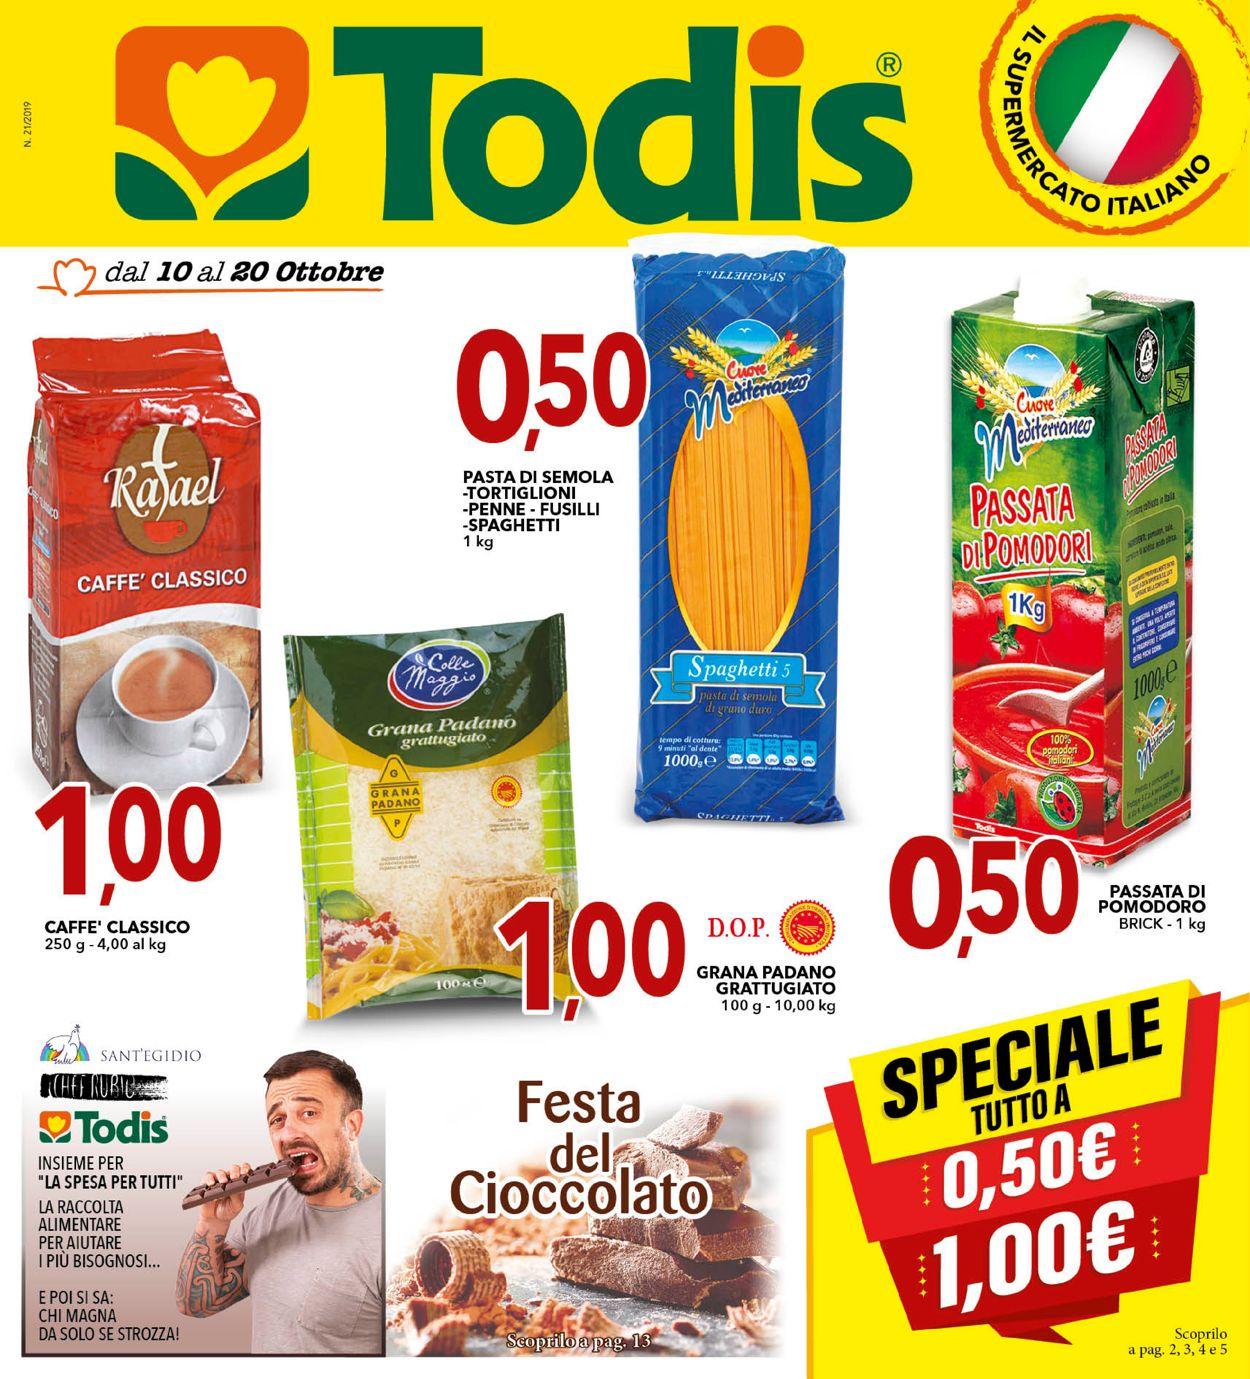 Volantino Todis - Offerte 10/10-20/10/2019